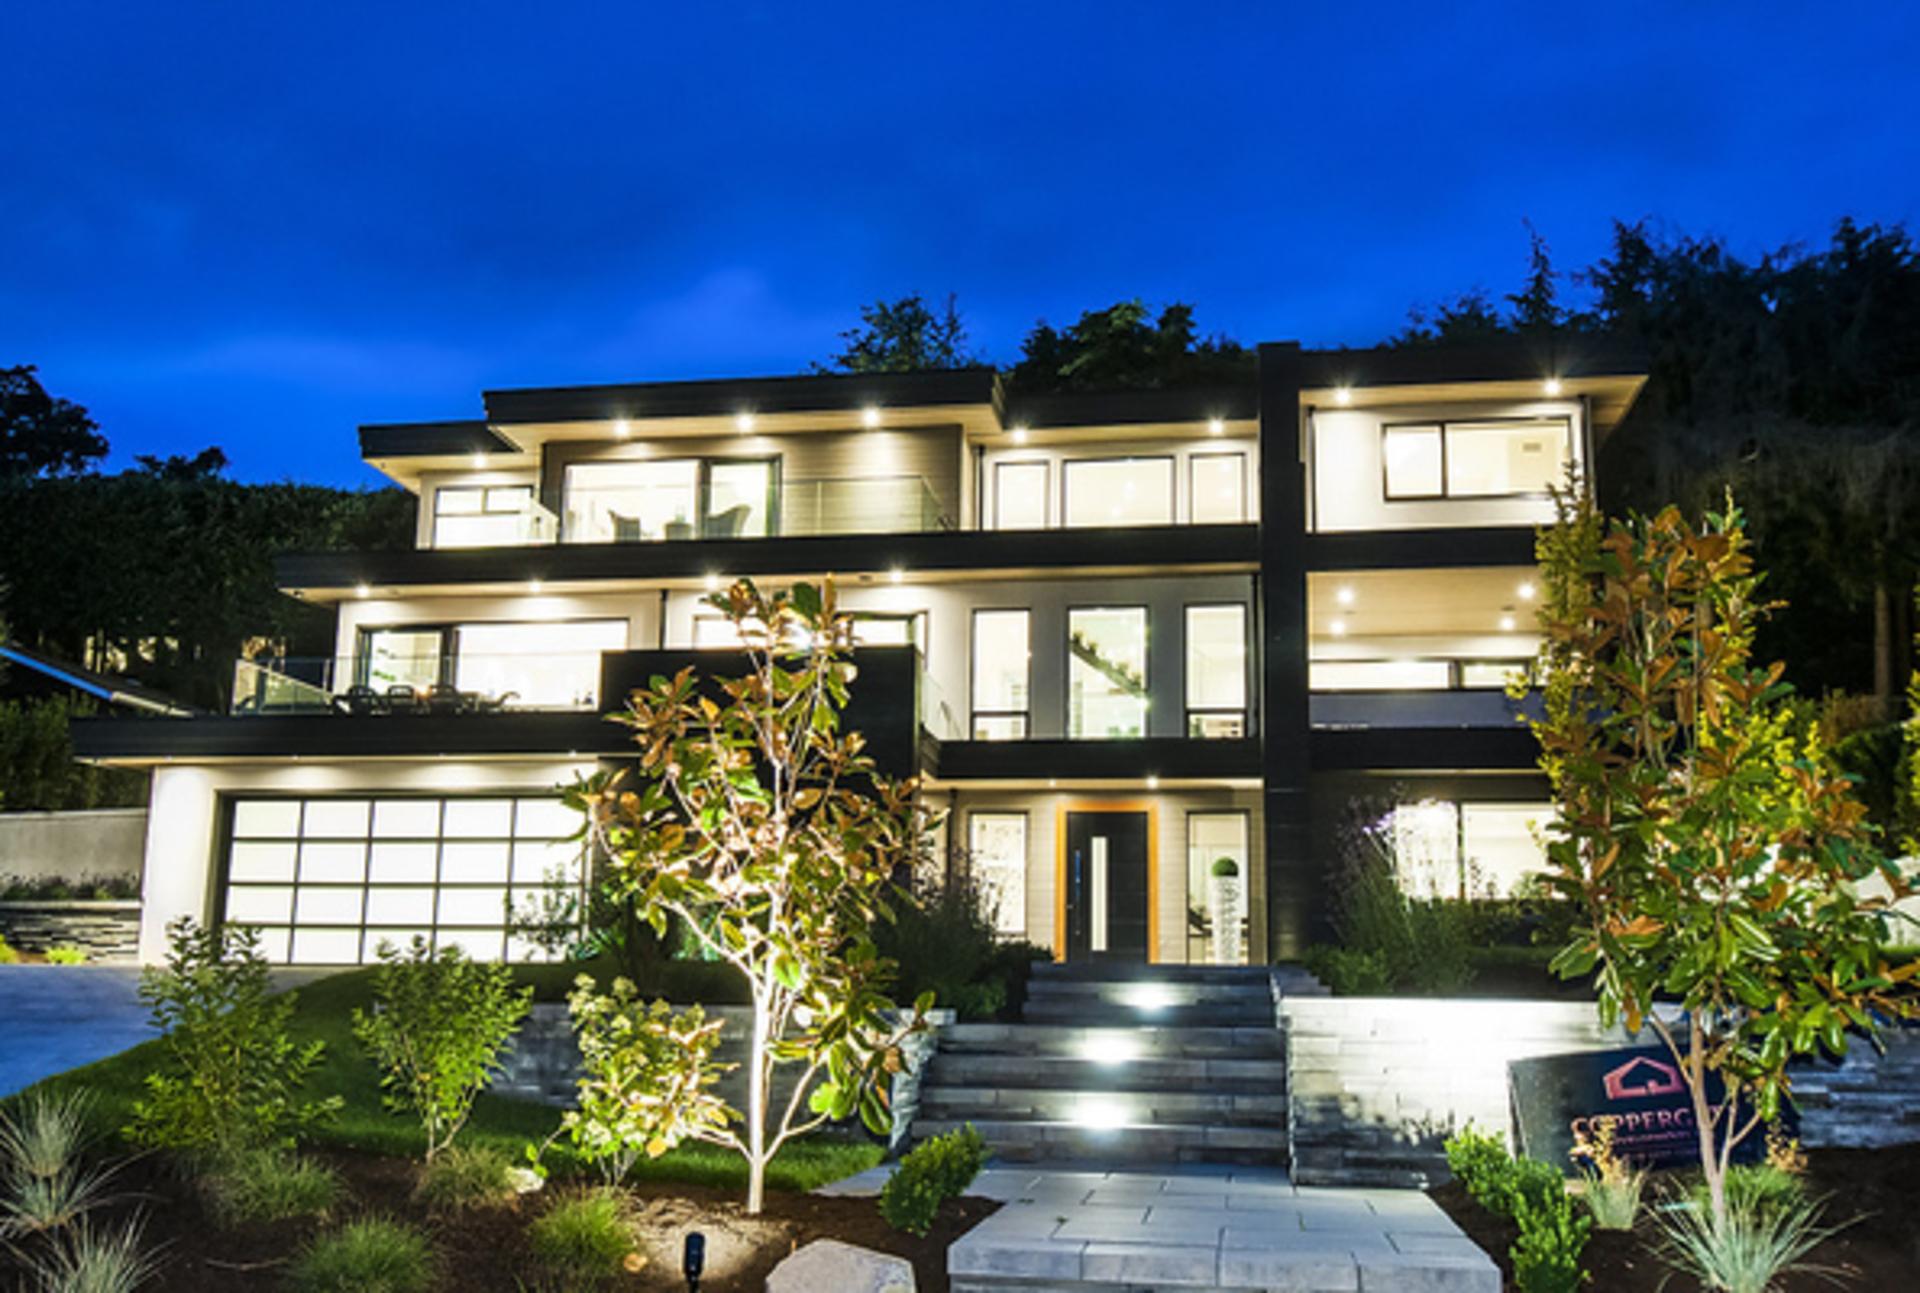 001 at 4113 Bayridge, Bayridge, West Vancouver